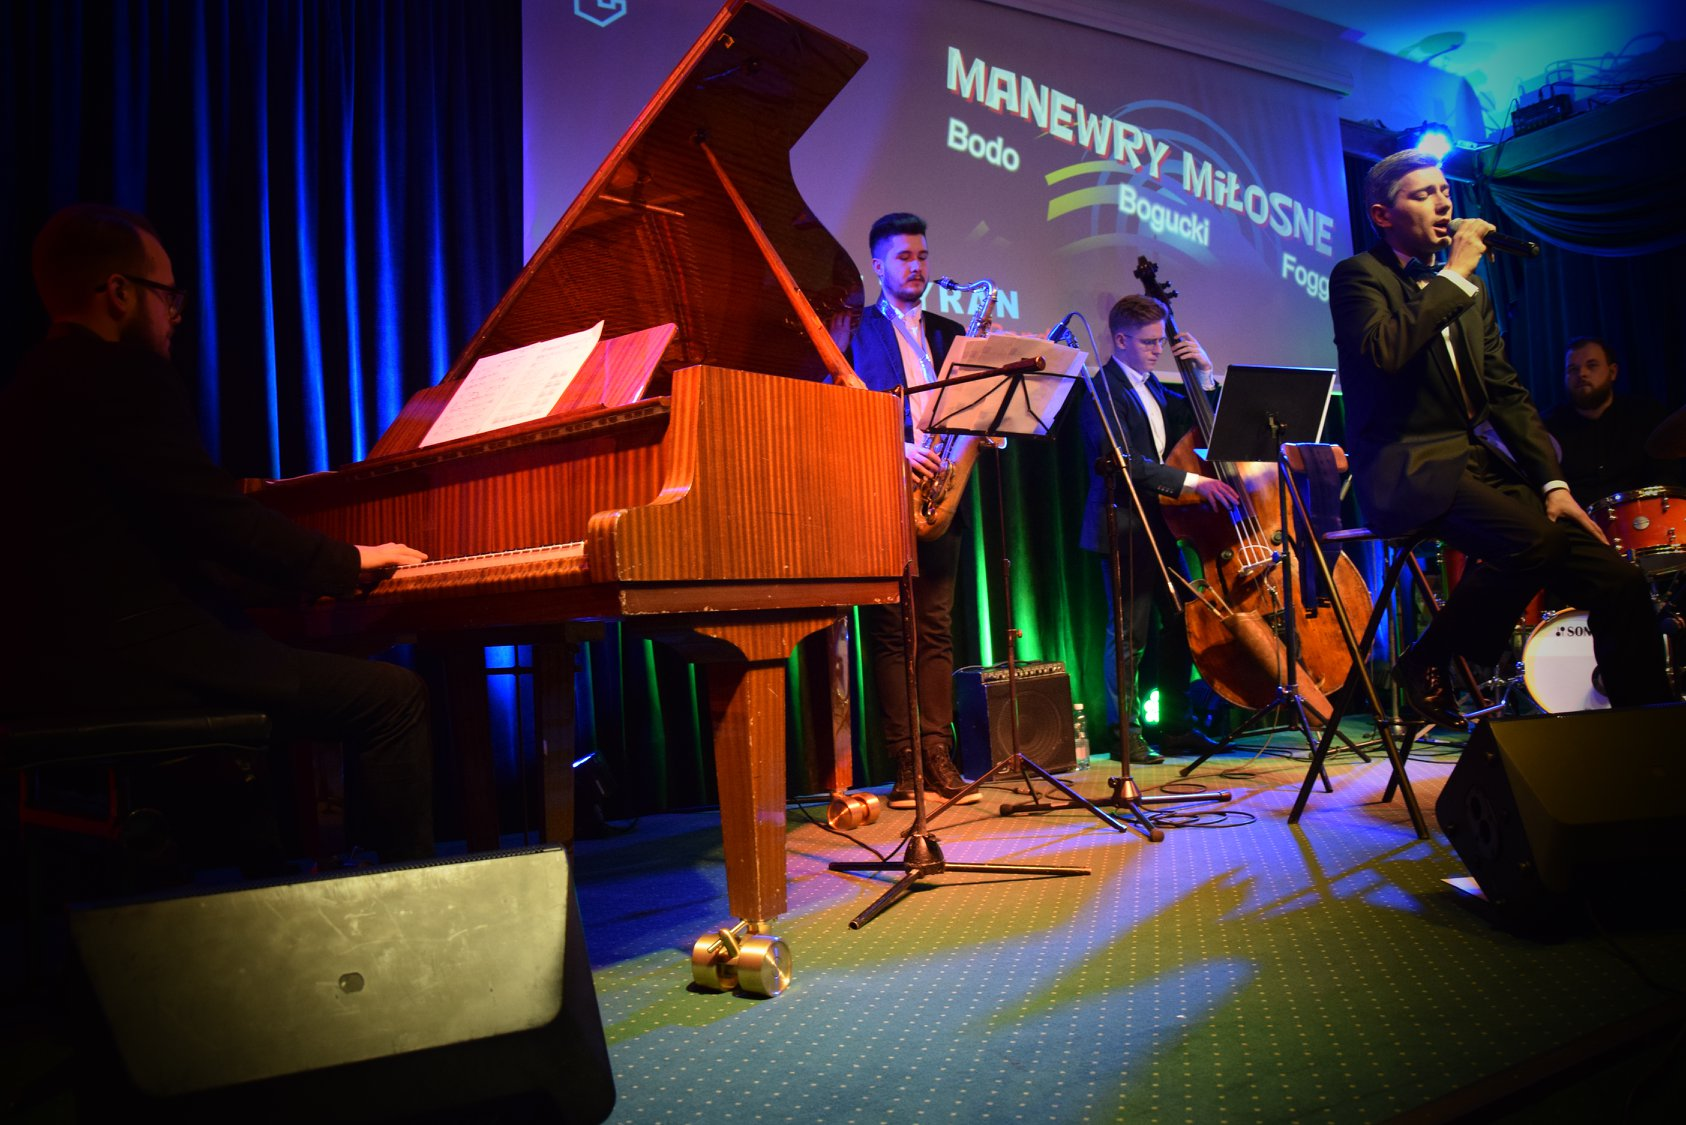 theART Agencja Artystyczna recital koncert Bodo Fogg